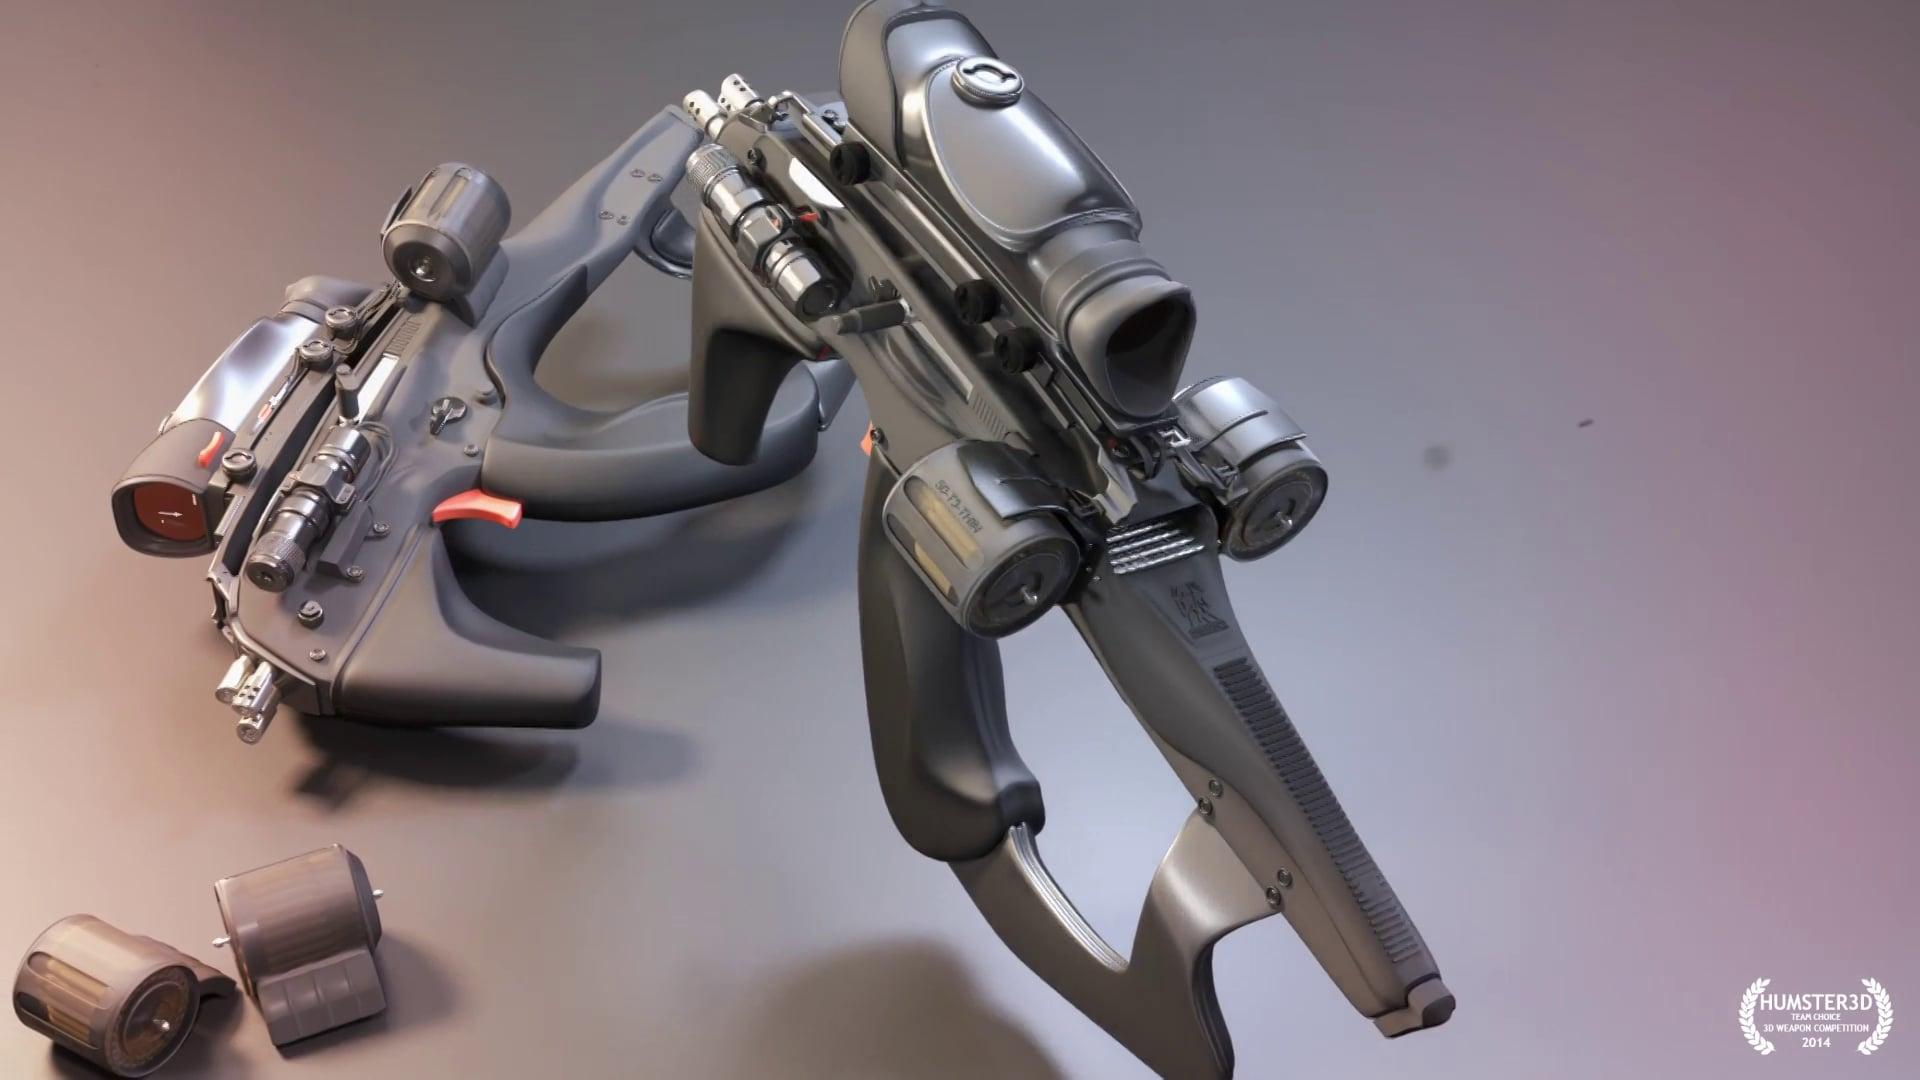 Hornet Tri-Shot Pistols